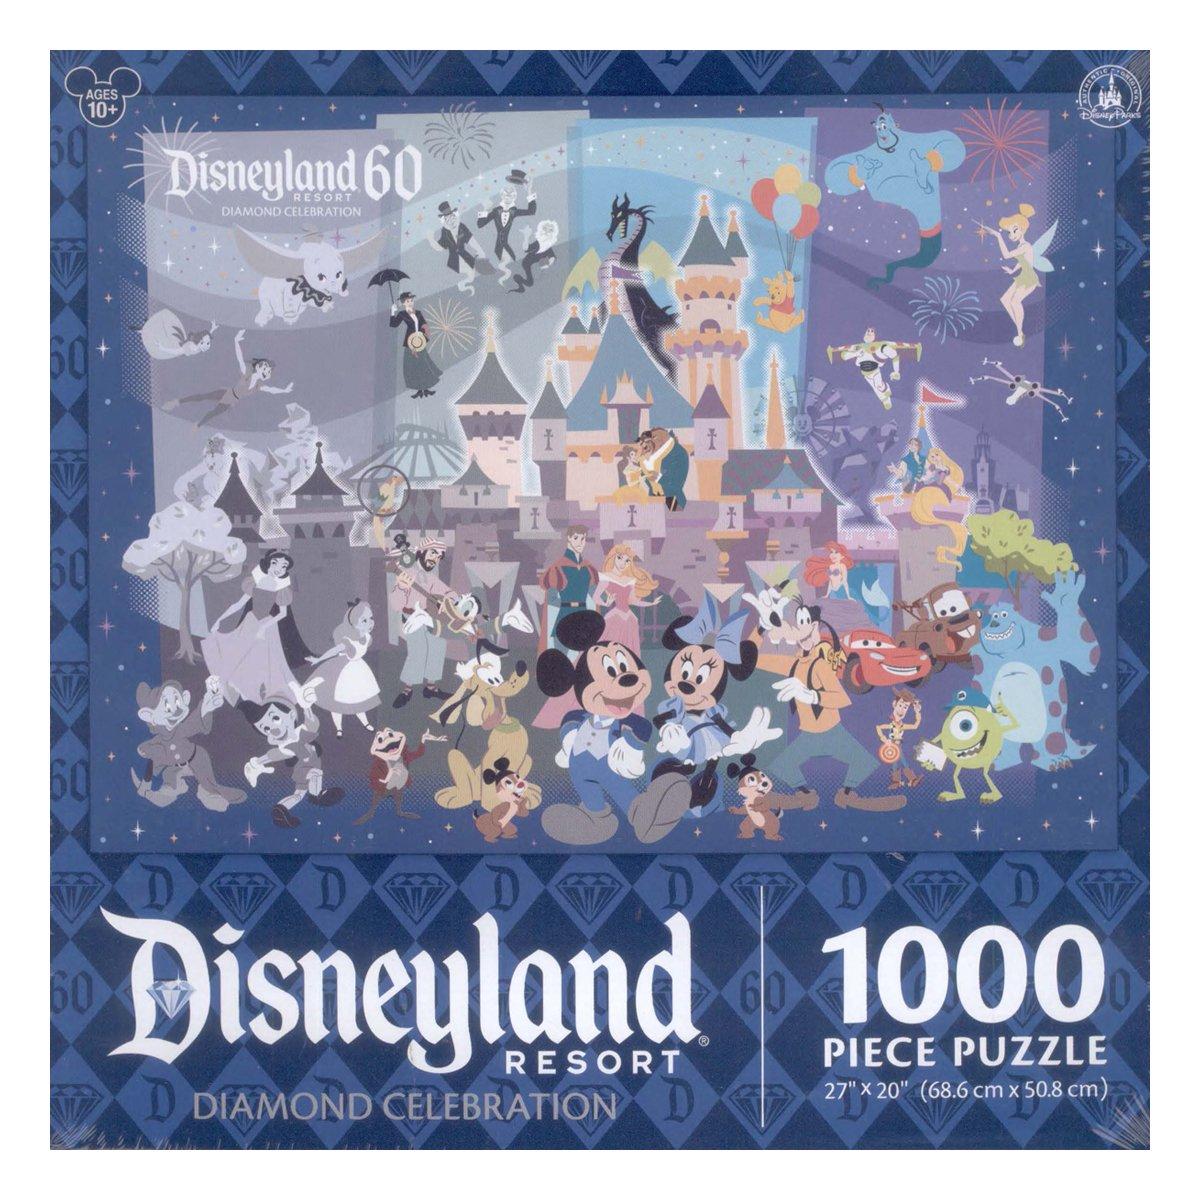 disneyland 60th diamond anniversary celebration 1000 piece jigsaw